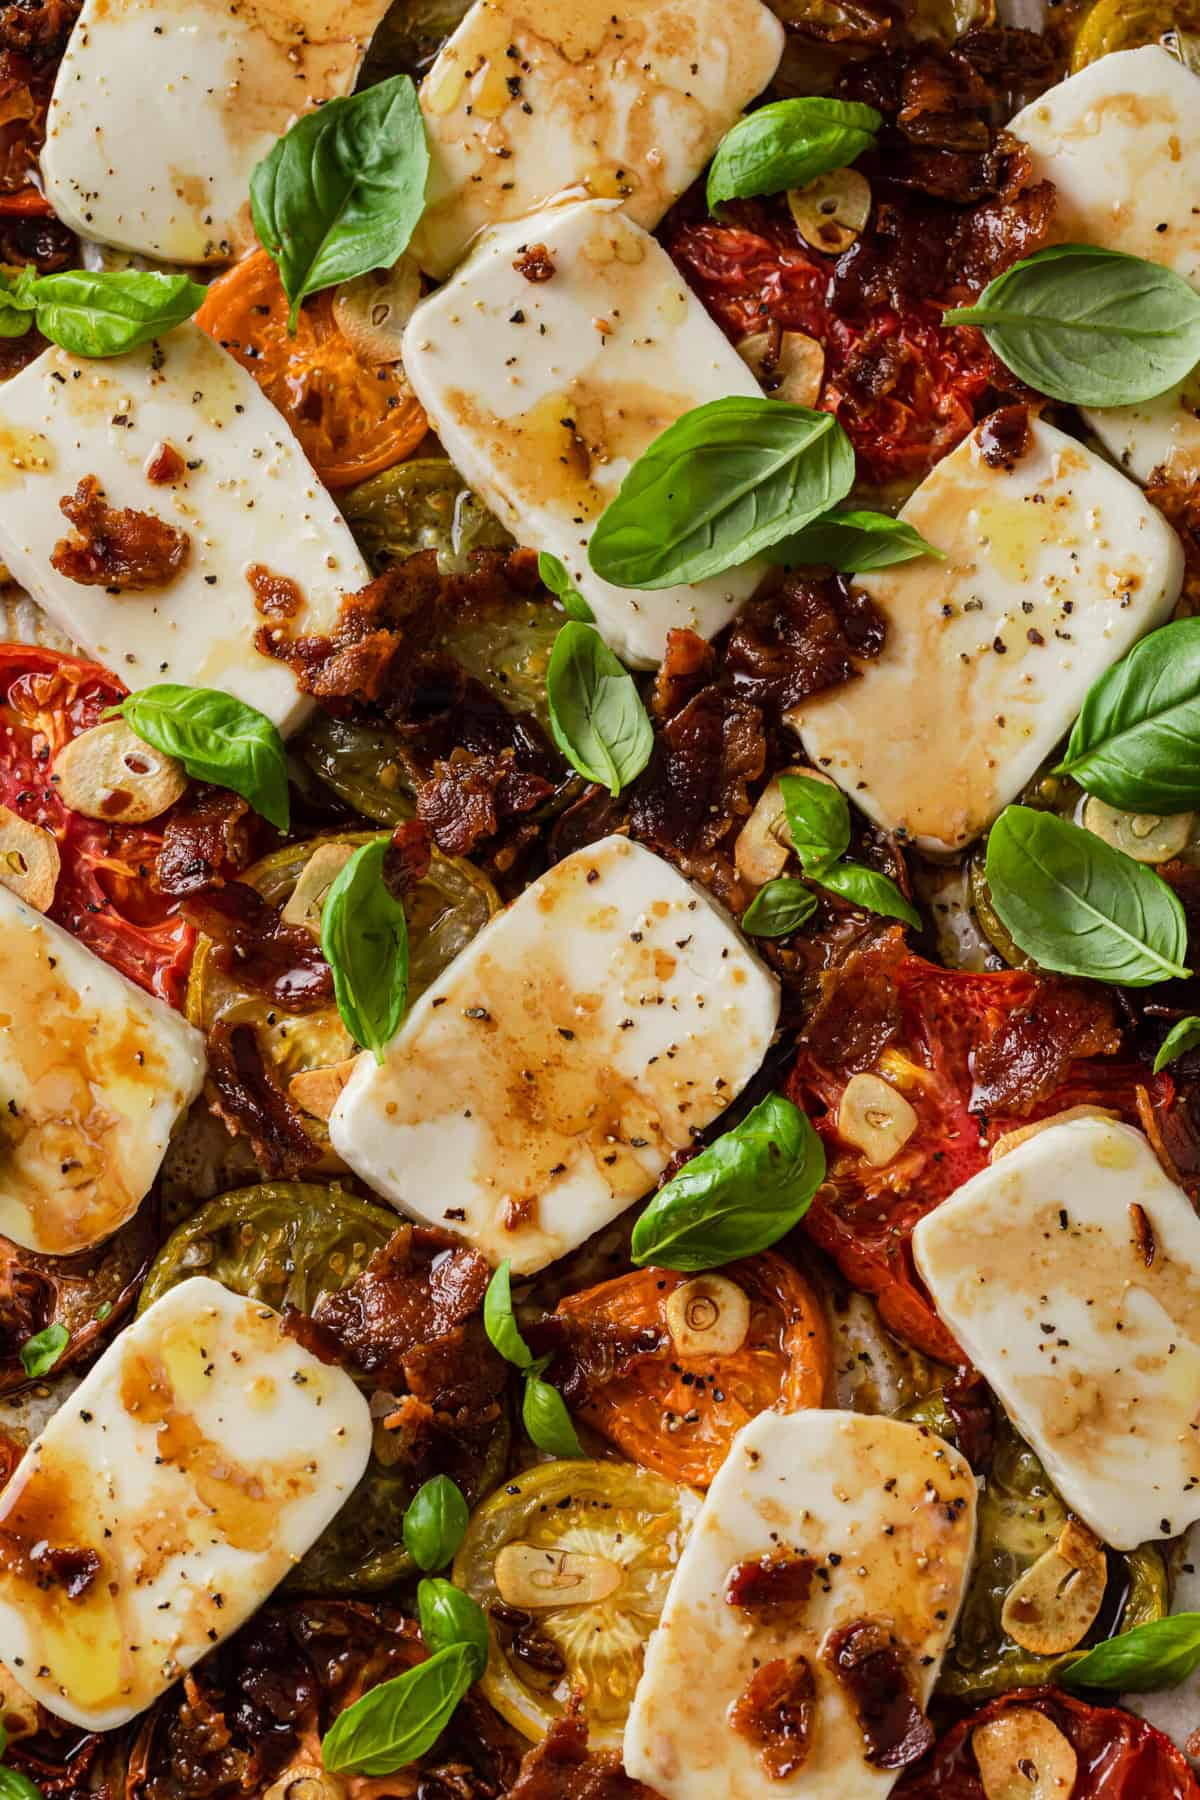 baking sheet with baked caprese salad - heirloom tomatoes, basil, fresh mozzarella, bacon, garlic, olive oil